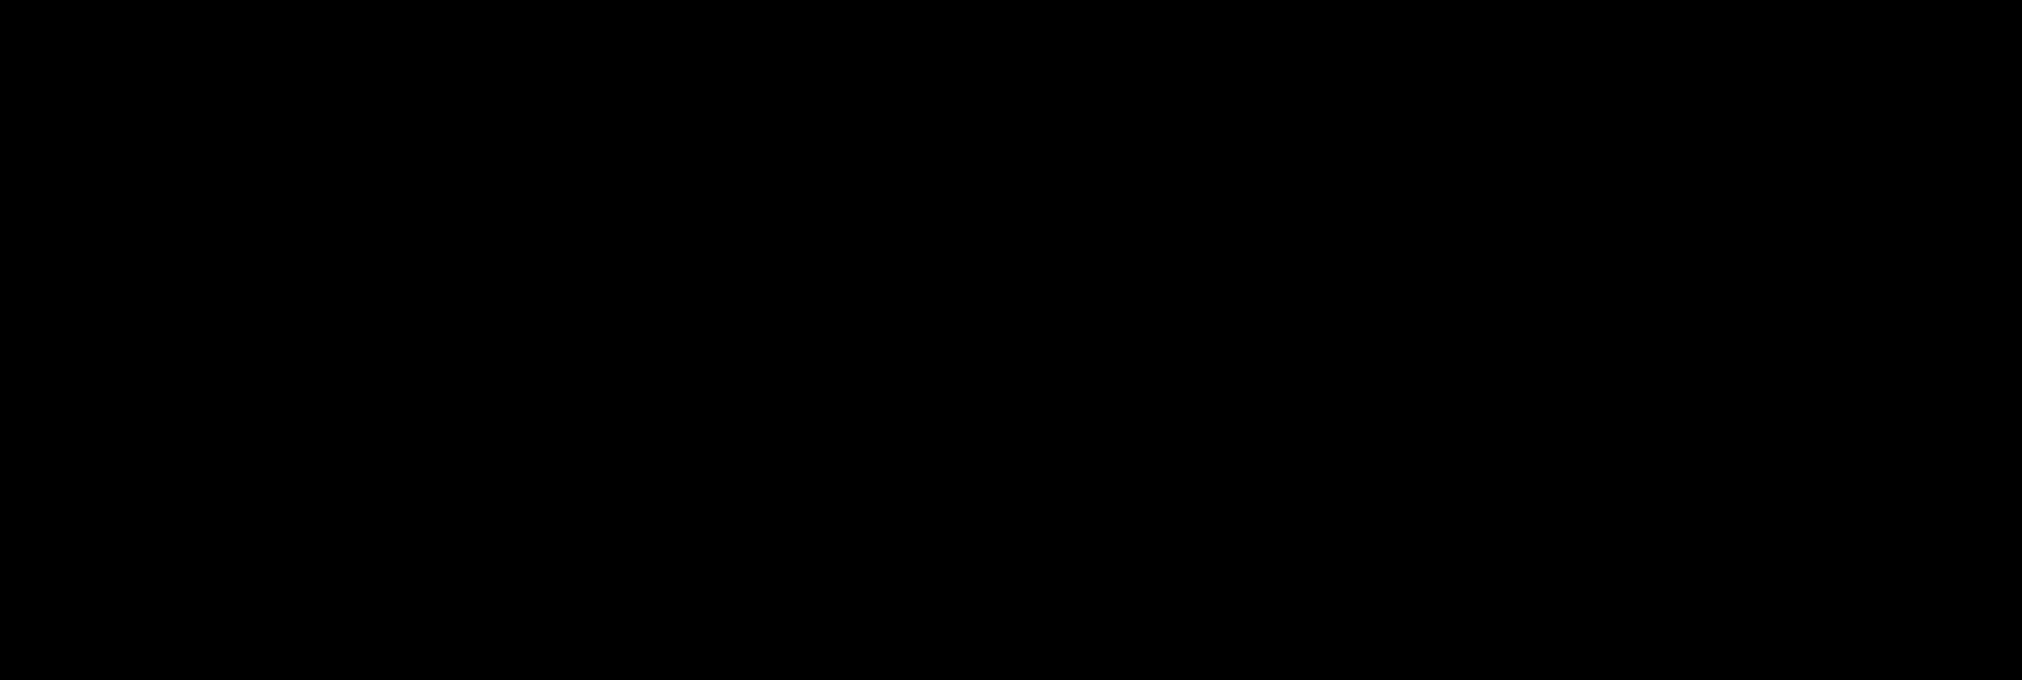 RL71-d<sub>6</sub>